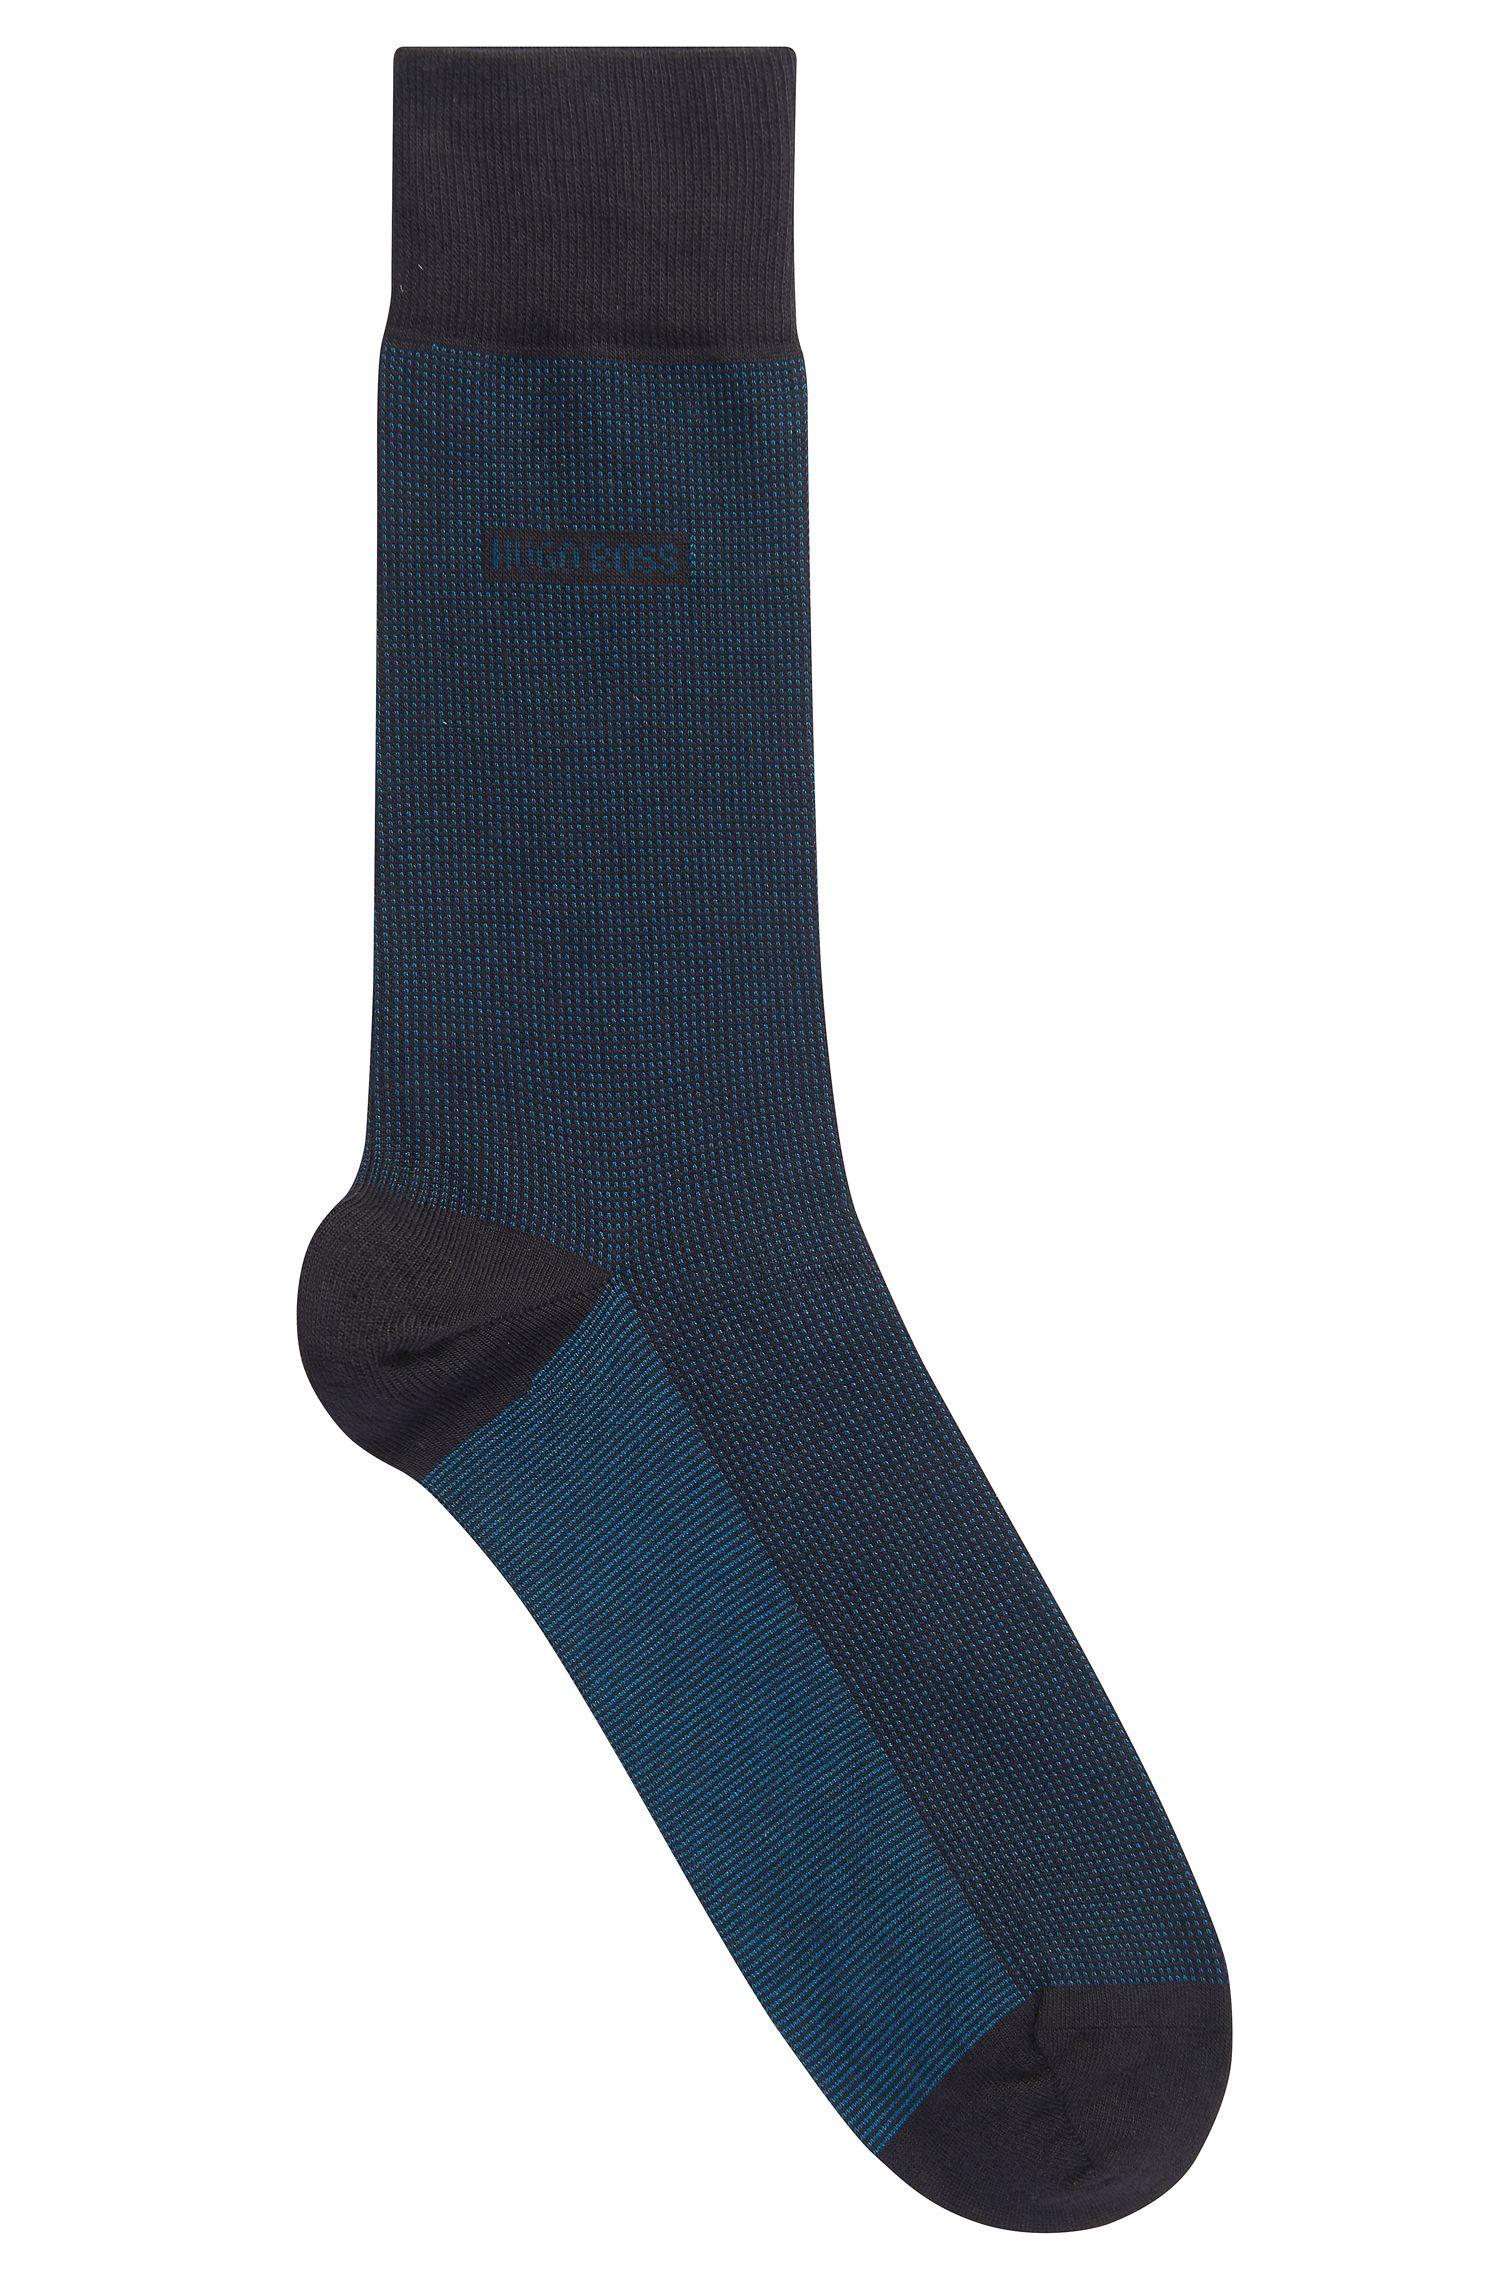 'RS Design US' | Stretch Cotton Silk Cashmere Blend Socks